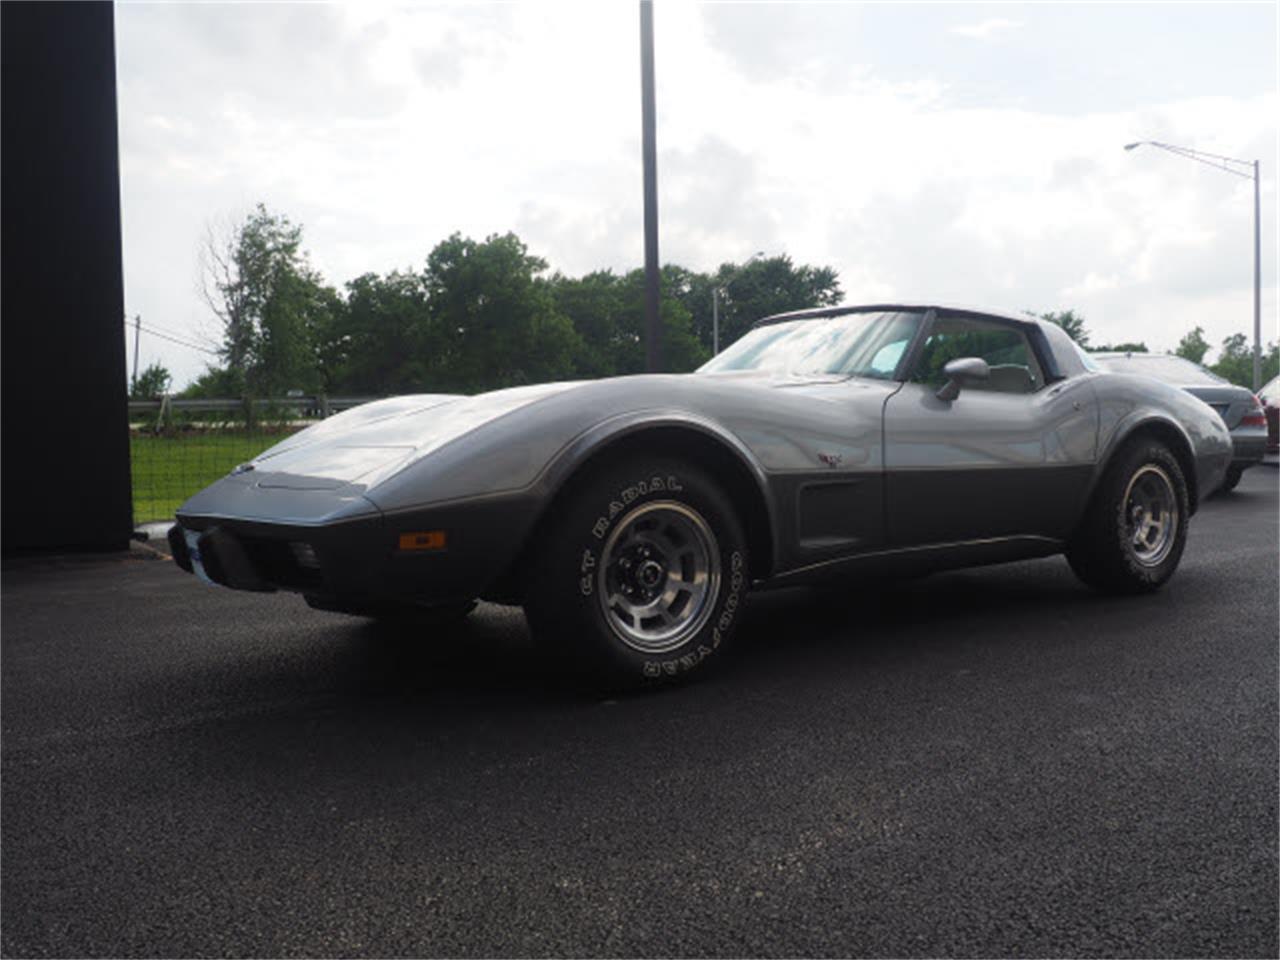 Large Picture of '78 Chevrolet Corvette located in Marysville Ohio - $22,999.00 - NMOD